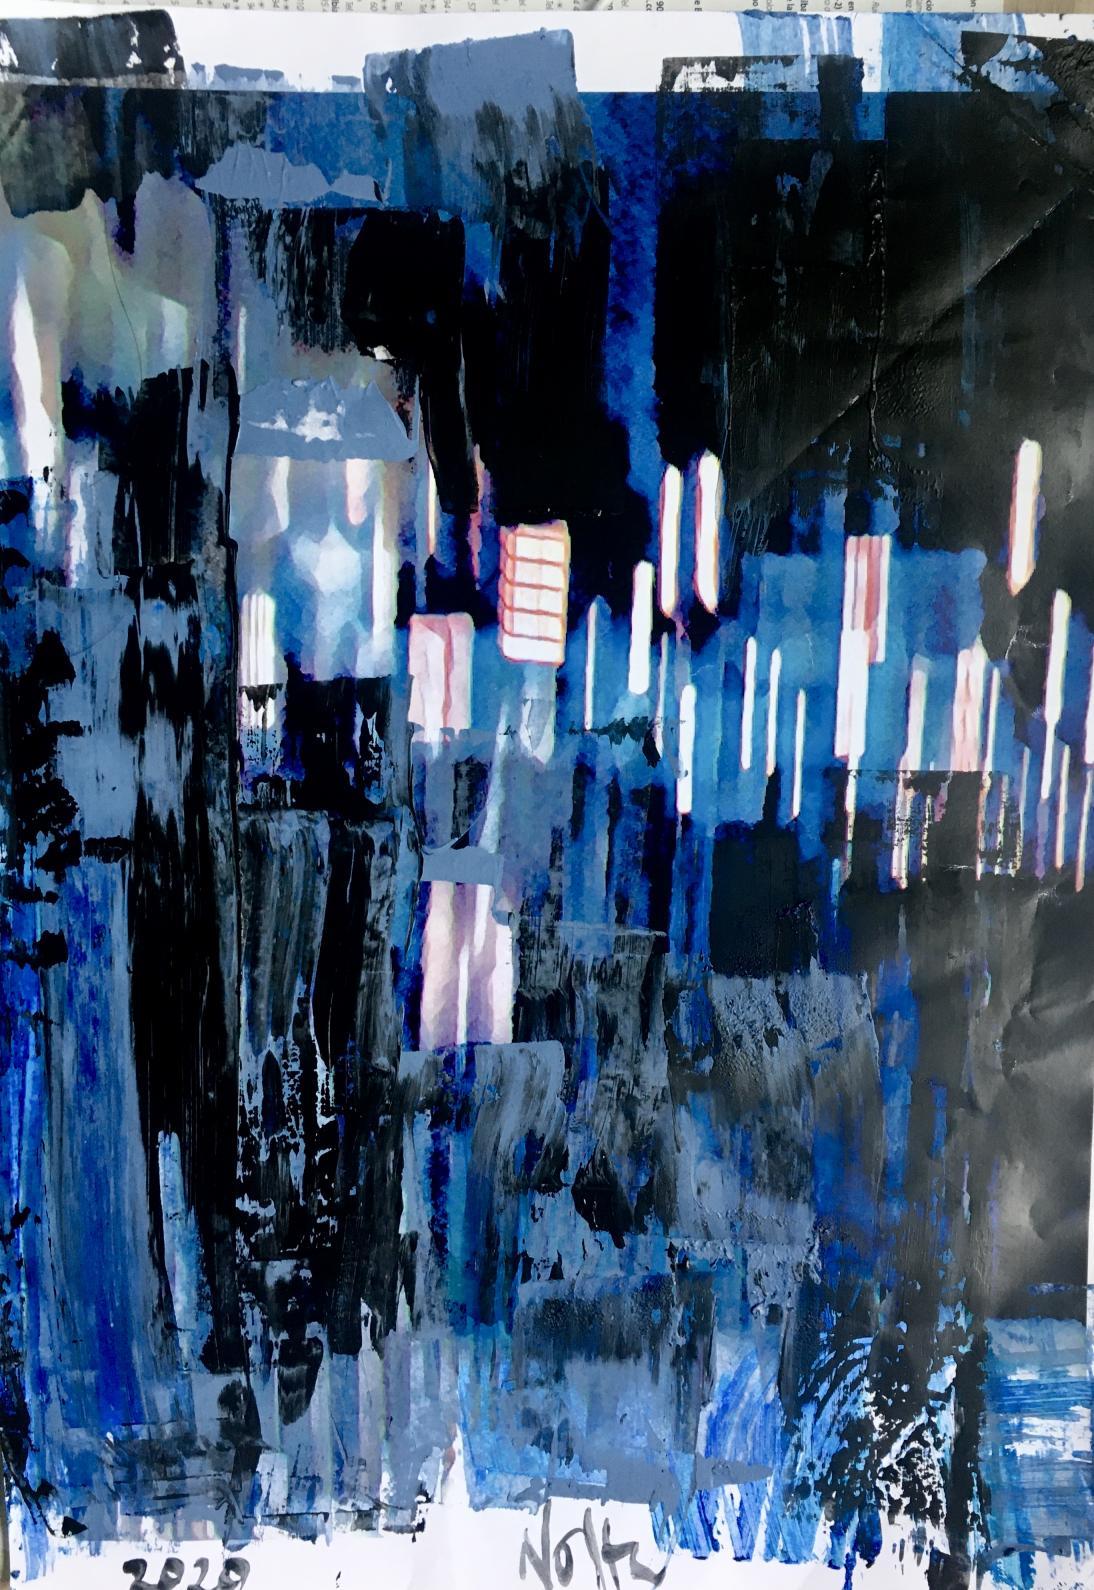 Balcones a las 20h (2020) - Erika Nolte